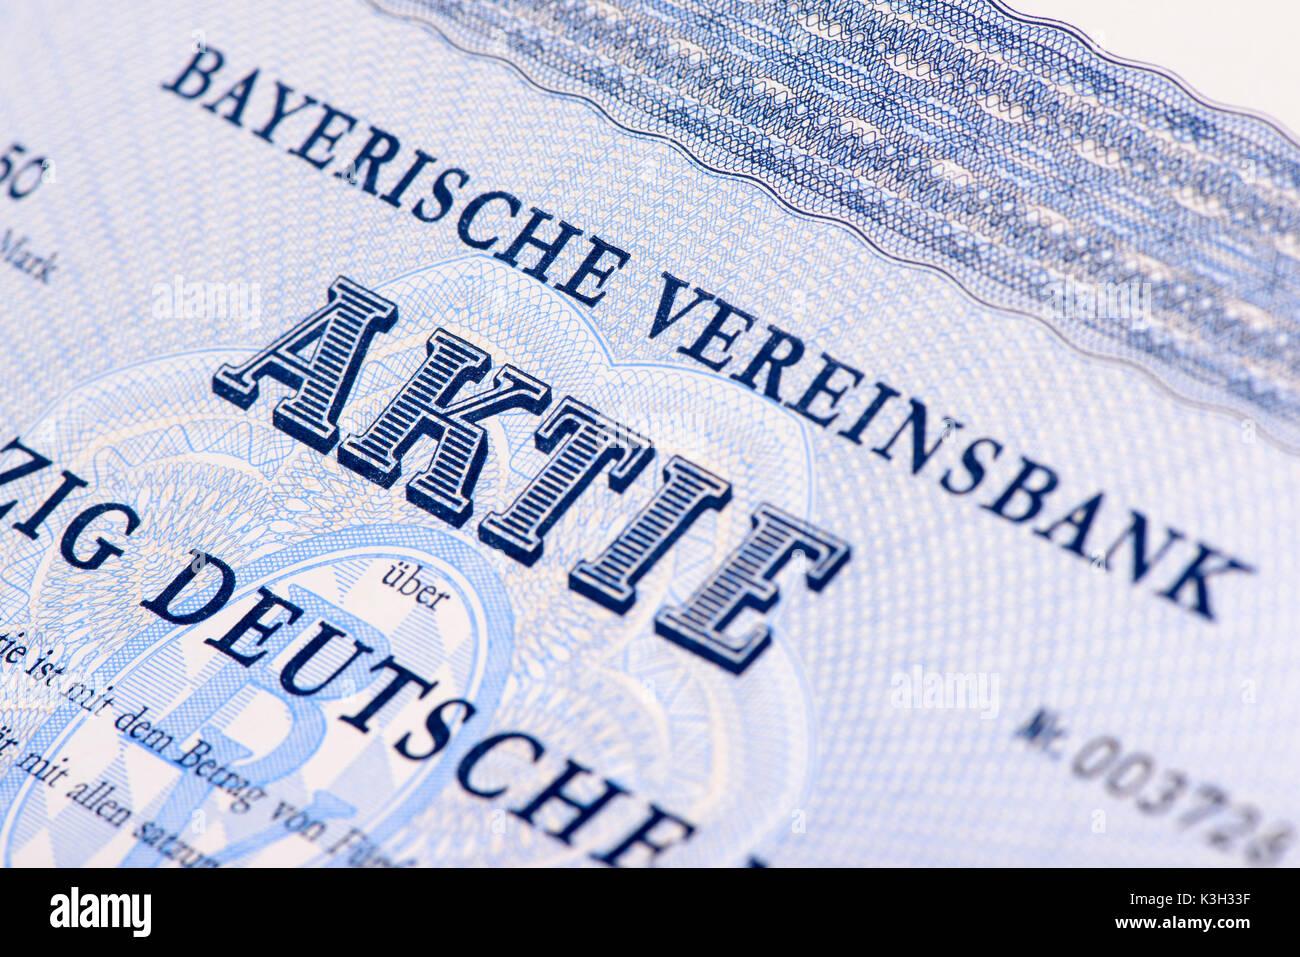 Stock of the Bayerische Vereinsbank - Stock Image